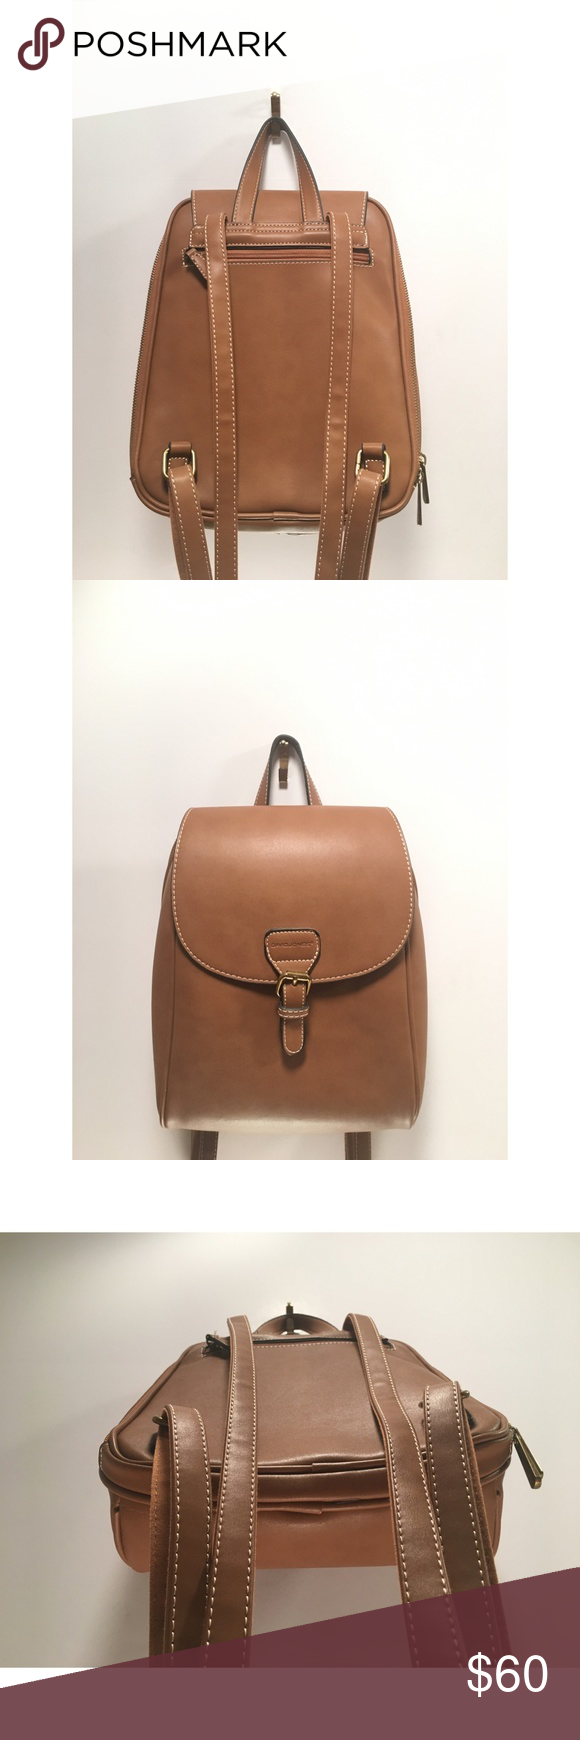 437830953bf3 David Jones Womens Faux Leather Mini Backpack Shoulder Bag Purses ...